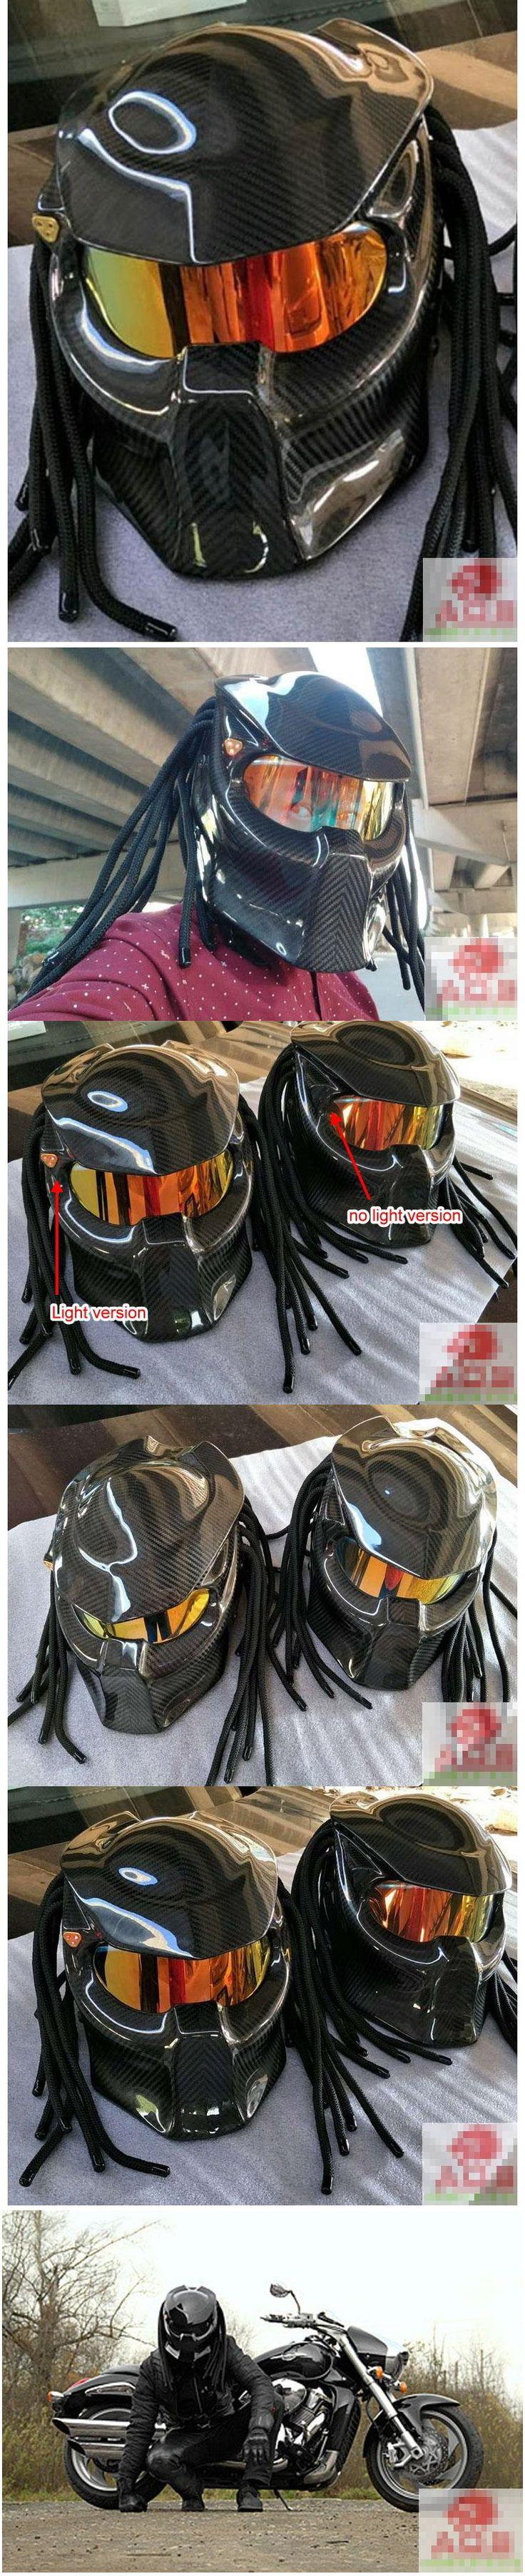 New Predator Motorcycle Full face Helmet Carbon Fibre Face